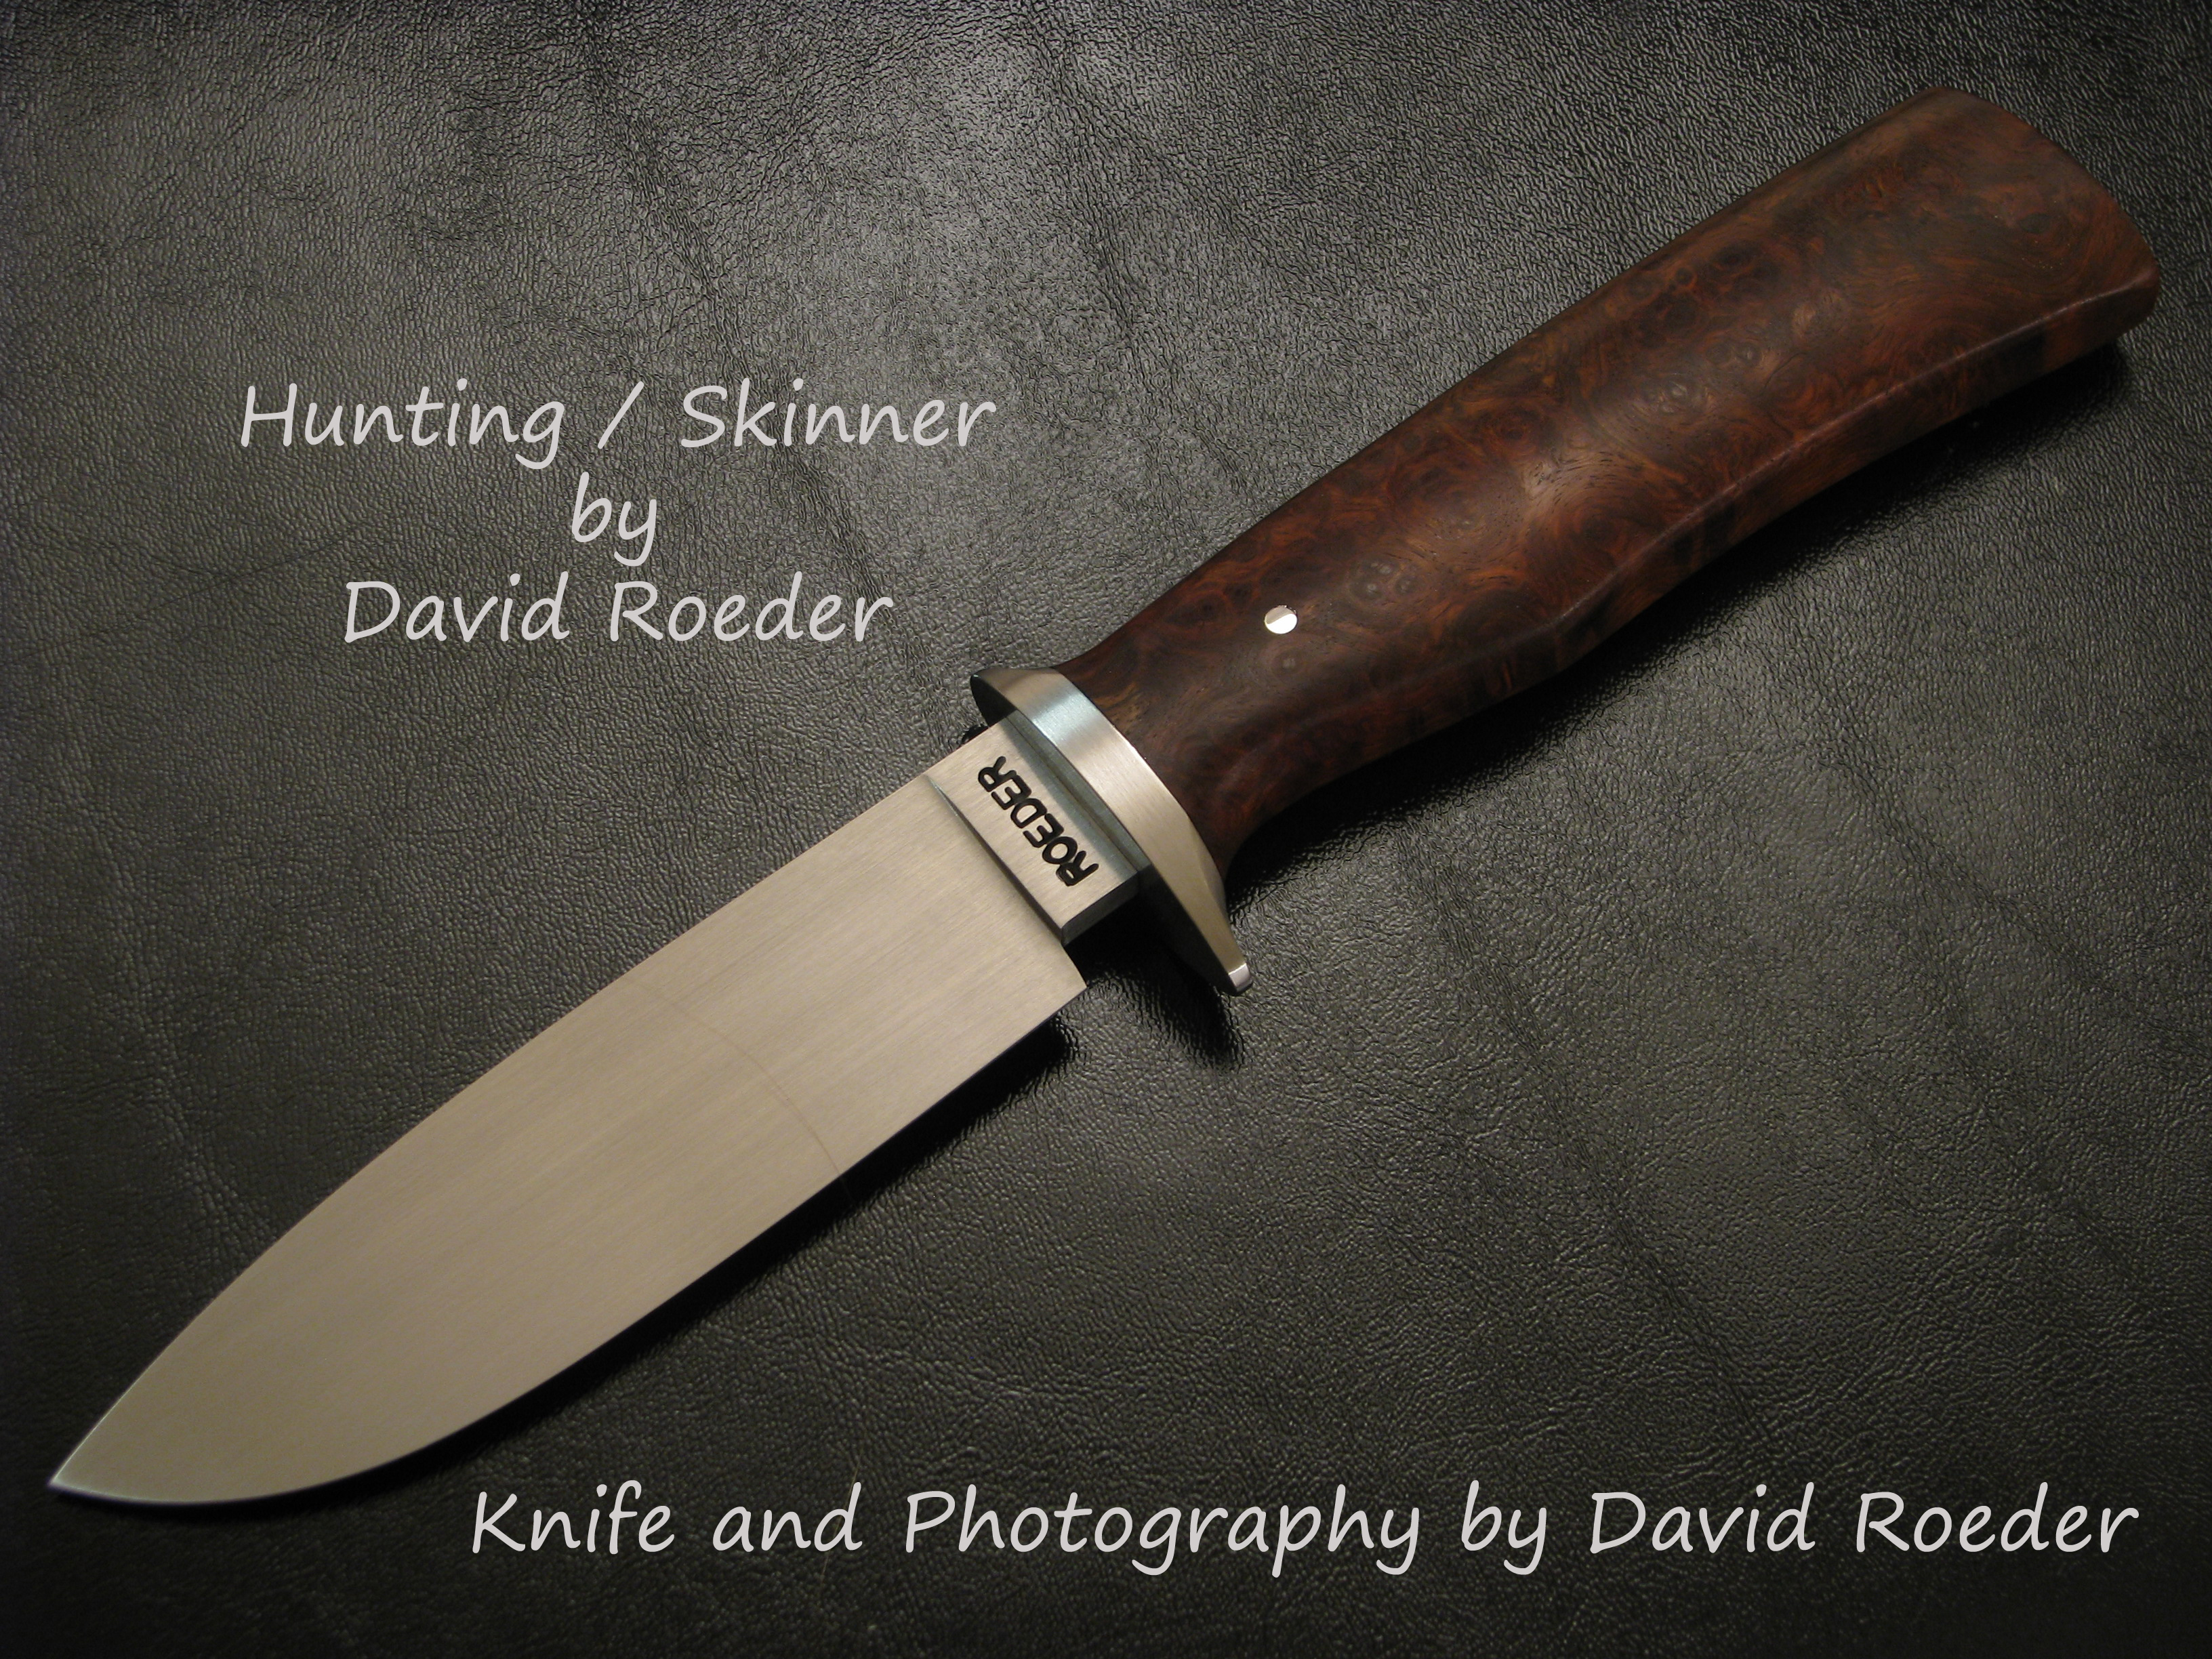 Hunter / Skinner by David Roeder